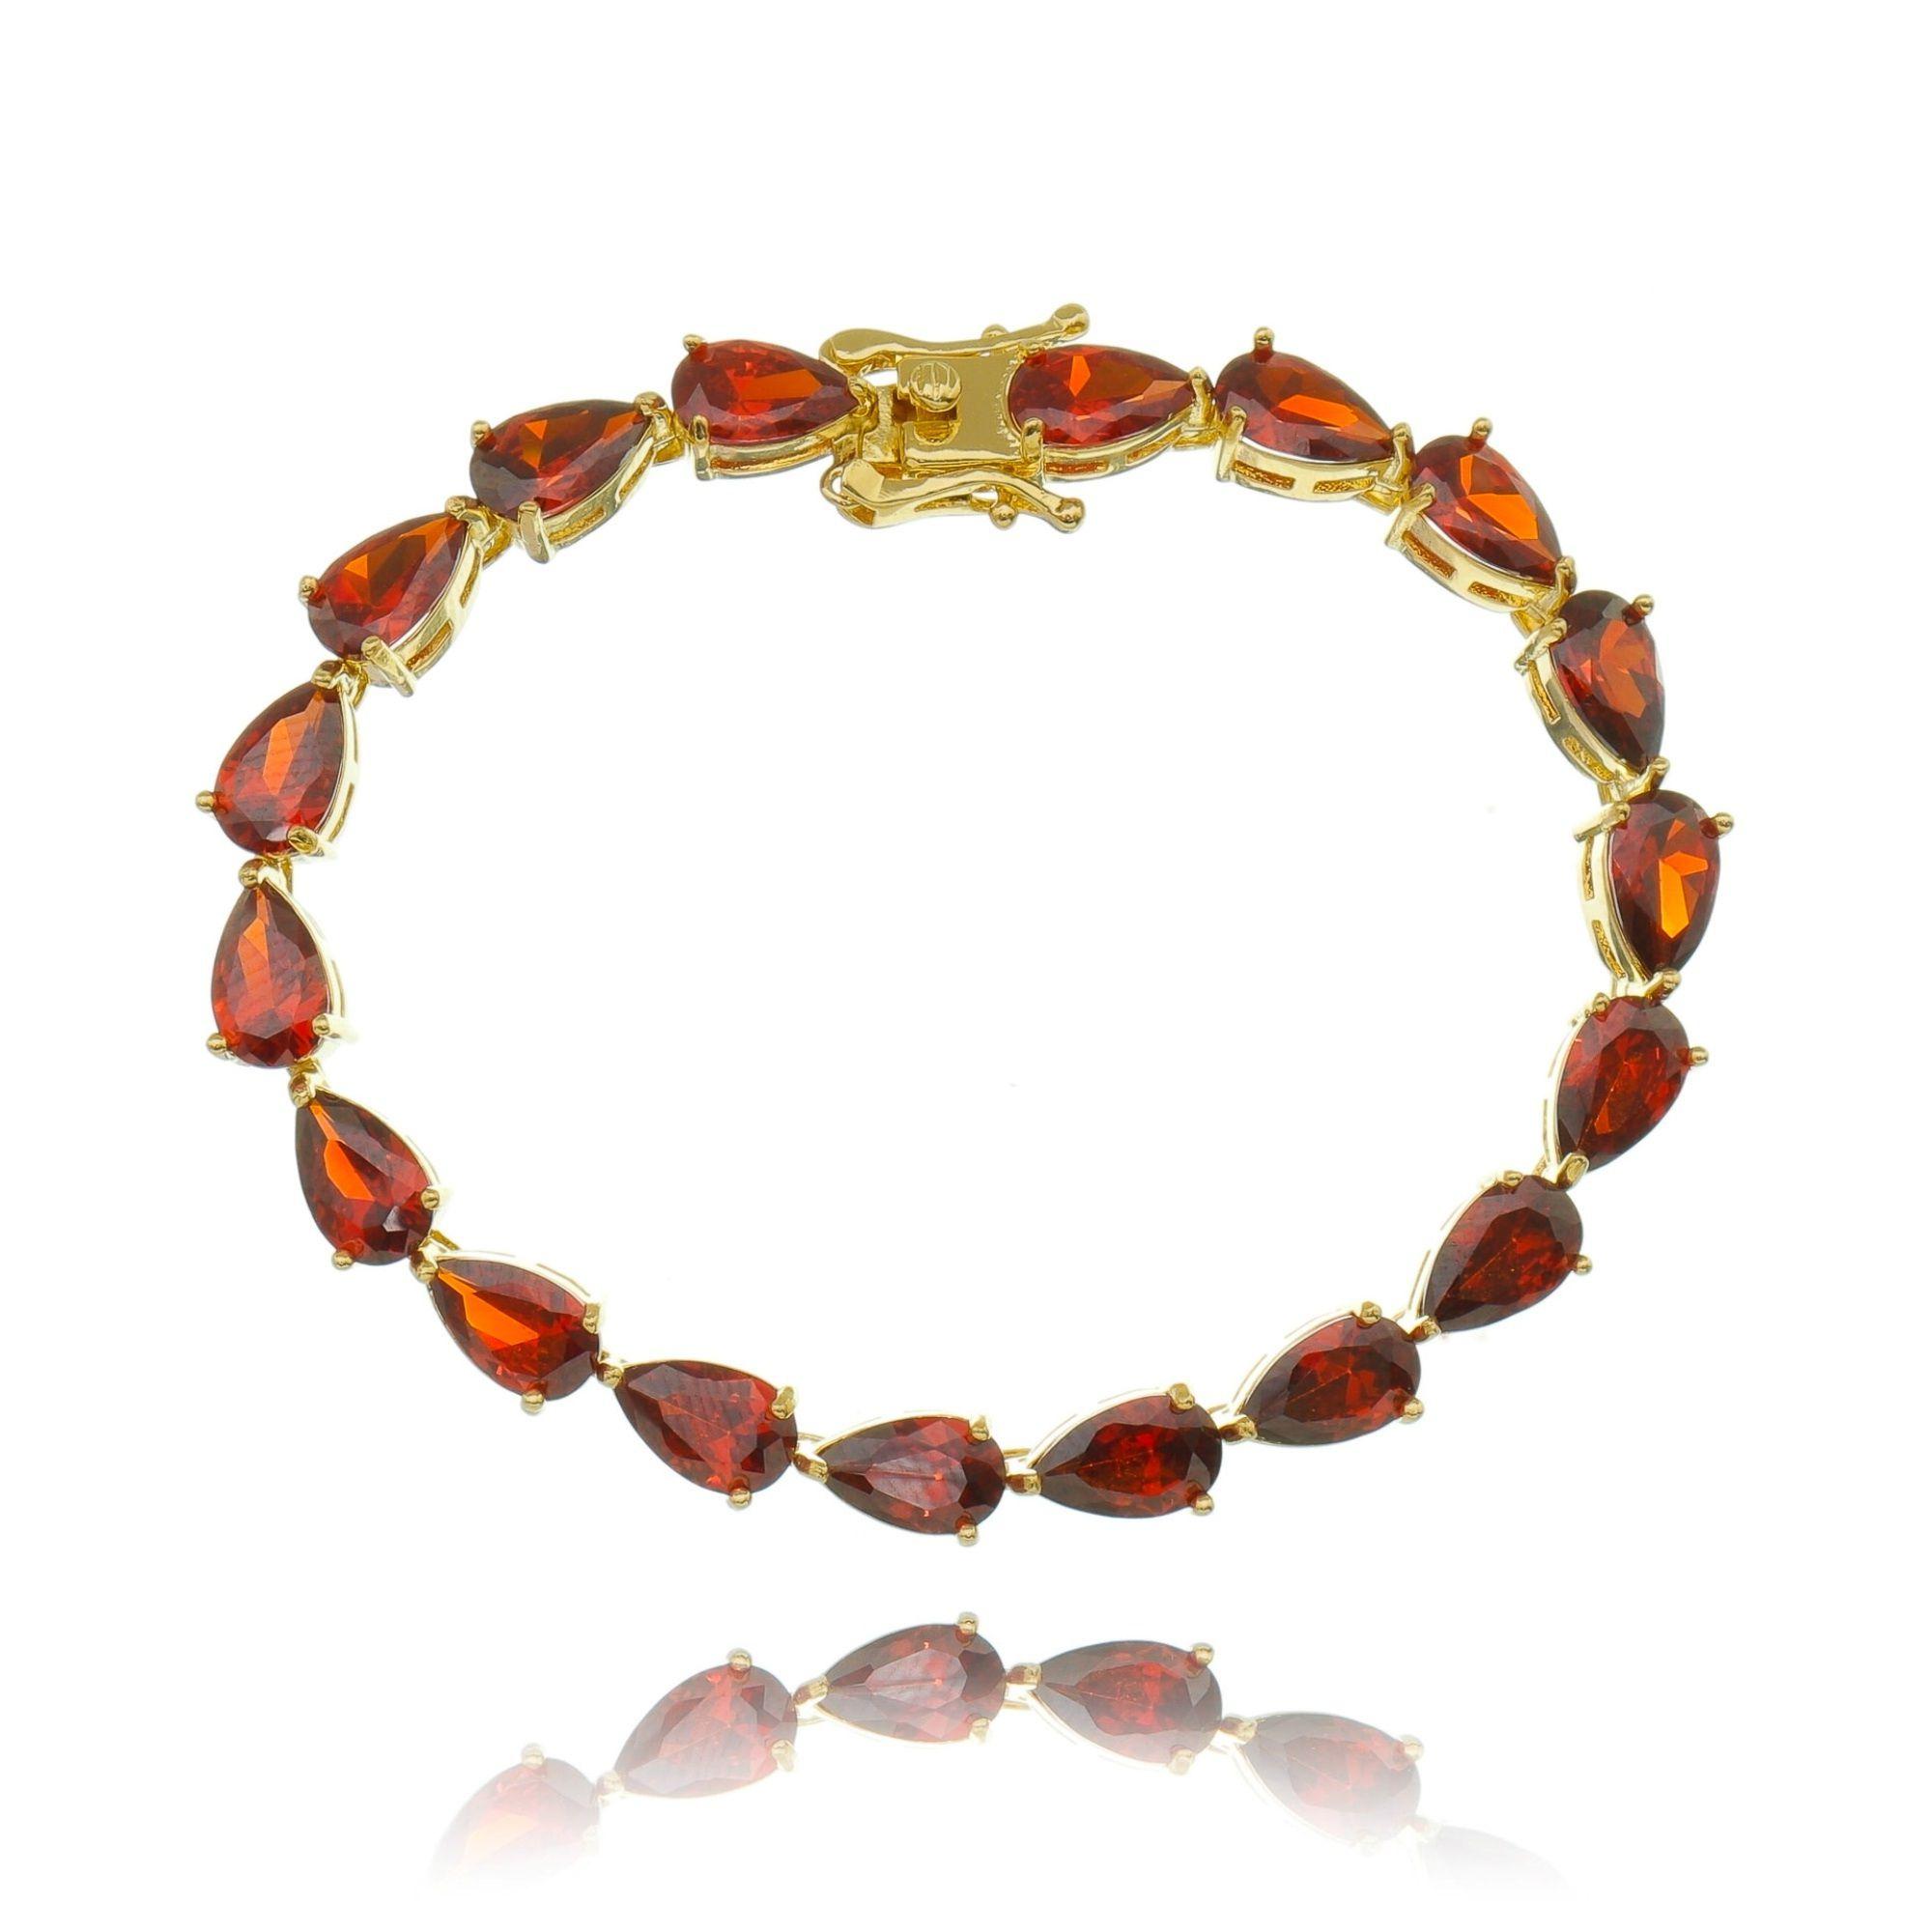 Pulseira Riviera Gota Vermelha Garnet Dourada Semijoia Ouro  - Soloyou